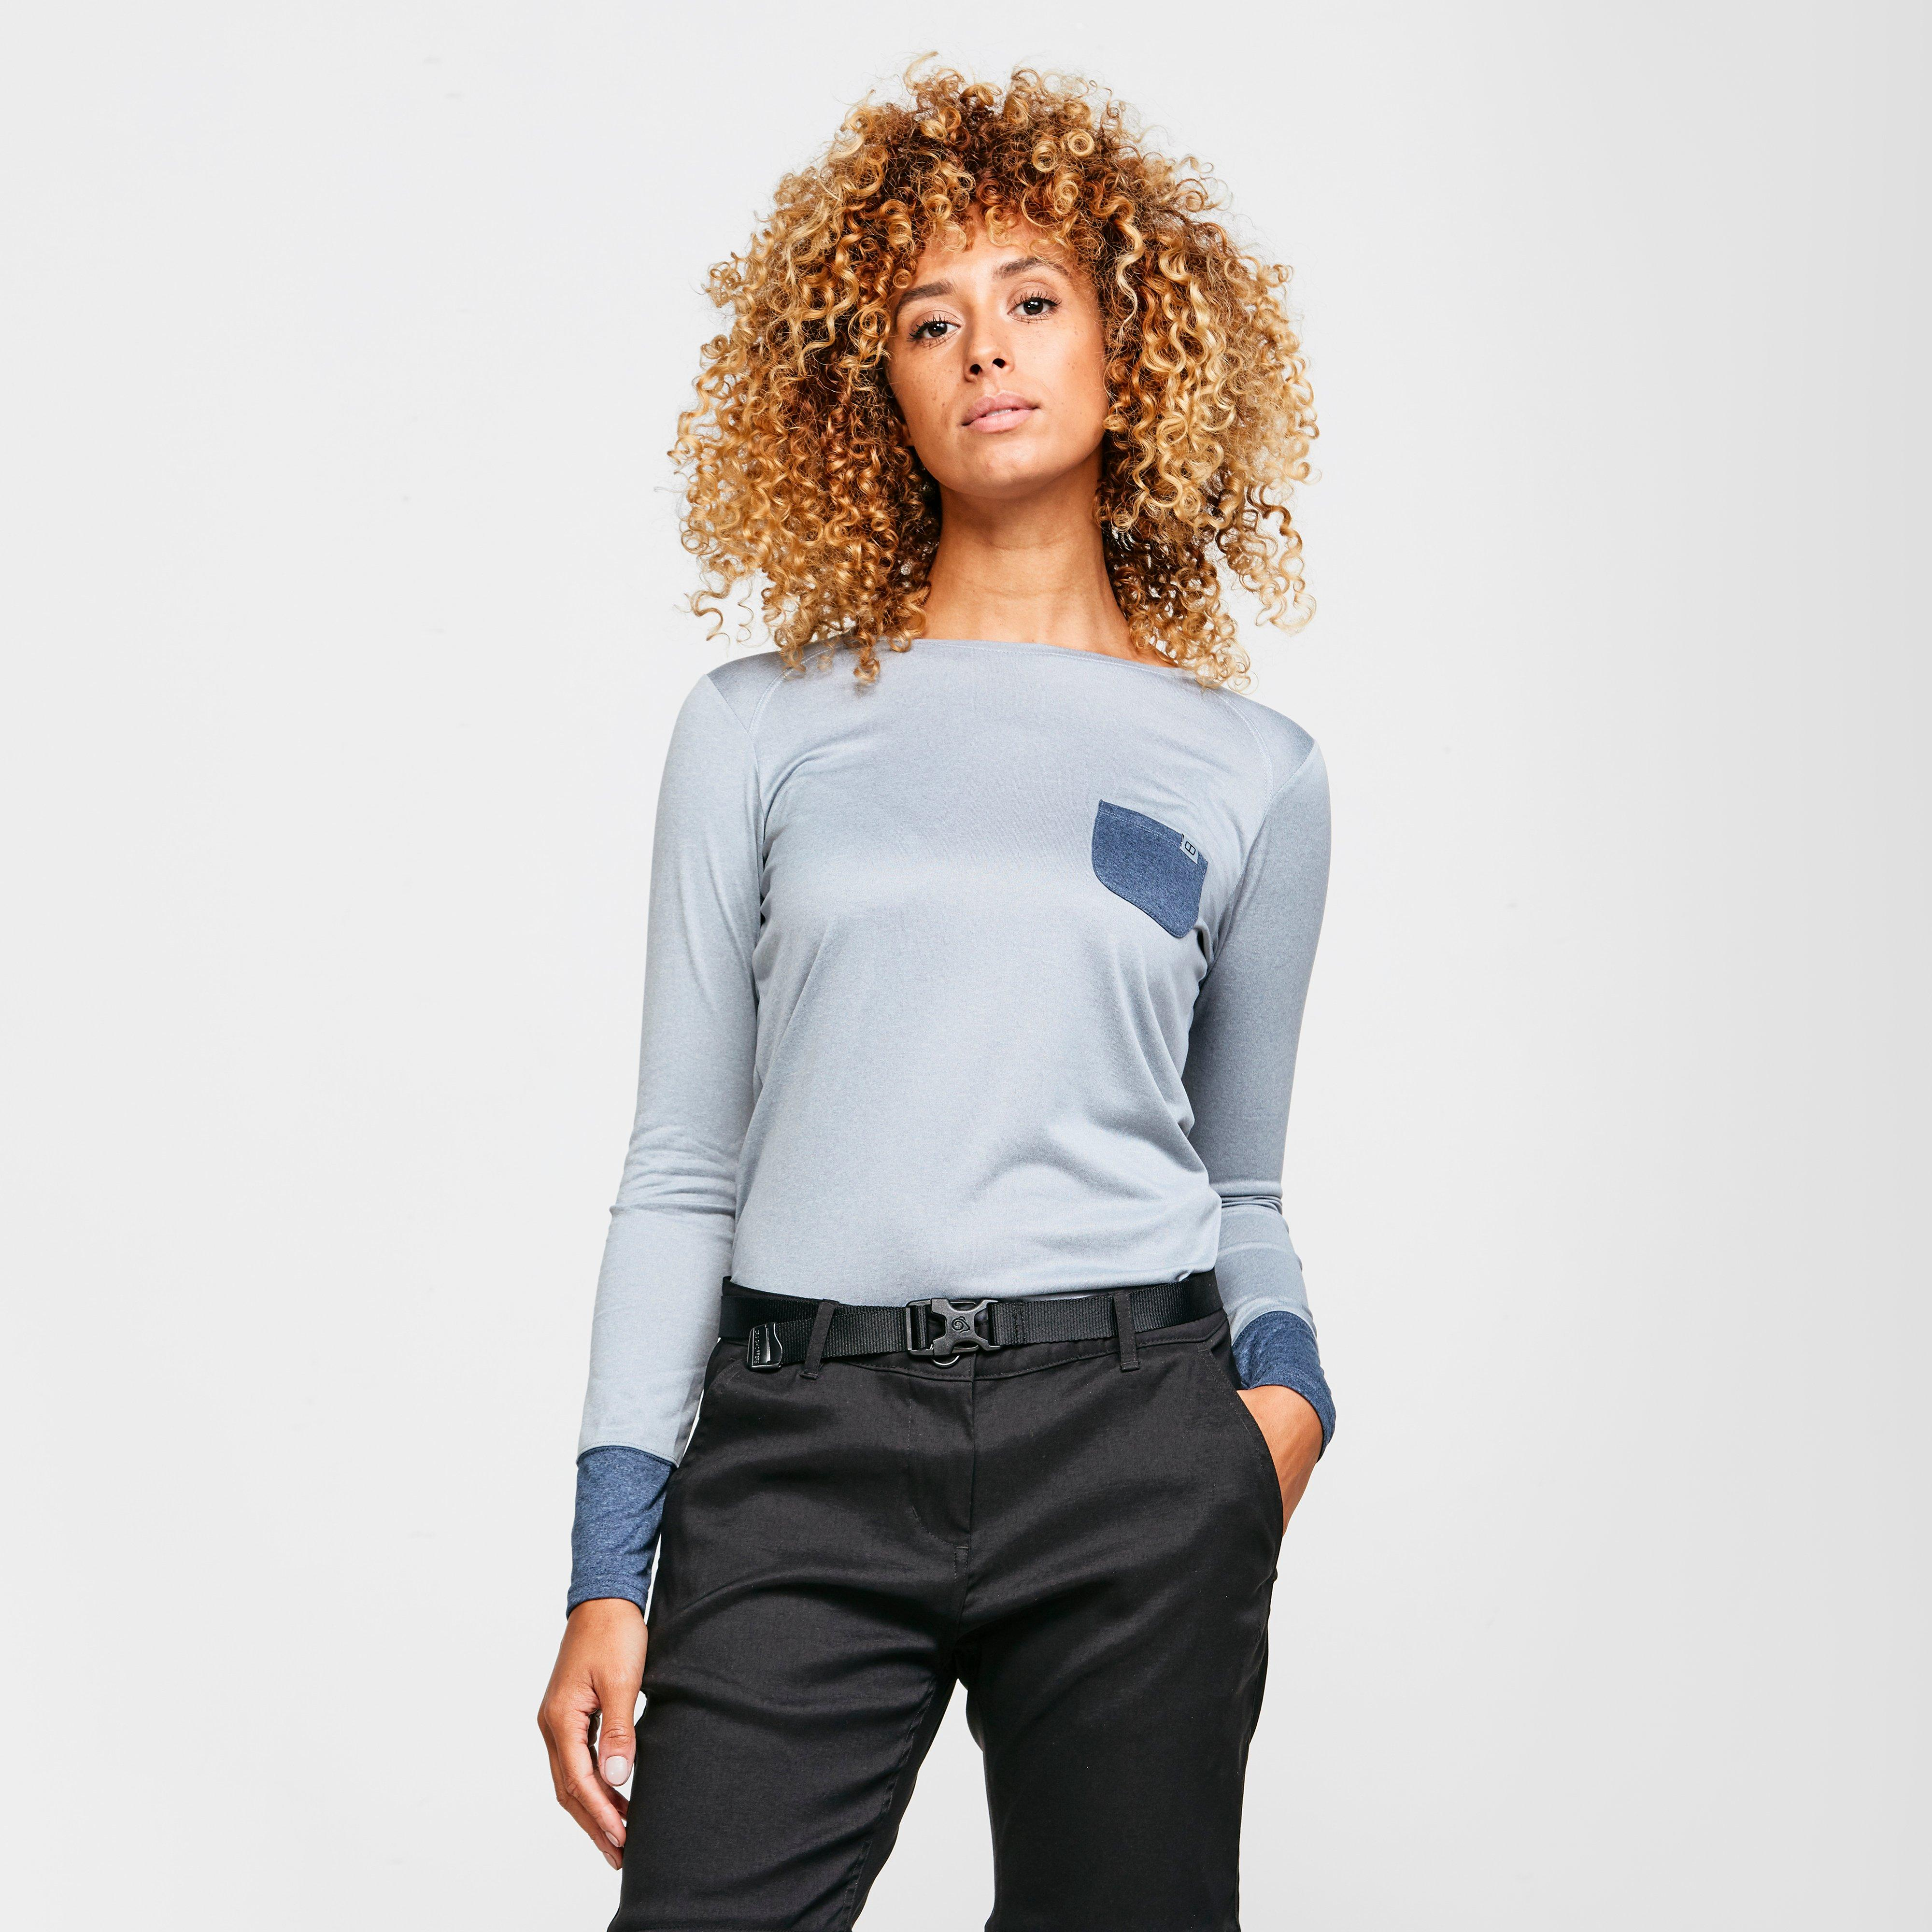 Berghaus Women's Explorer Long Sleeve Crew T-Shirt - Grey/Gry, Grey